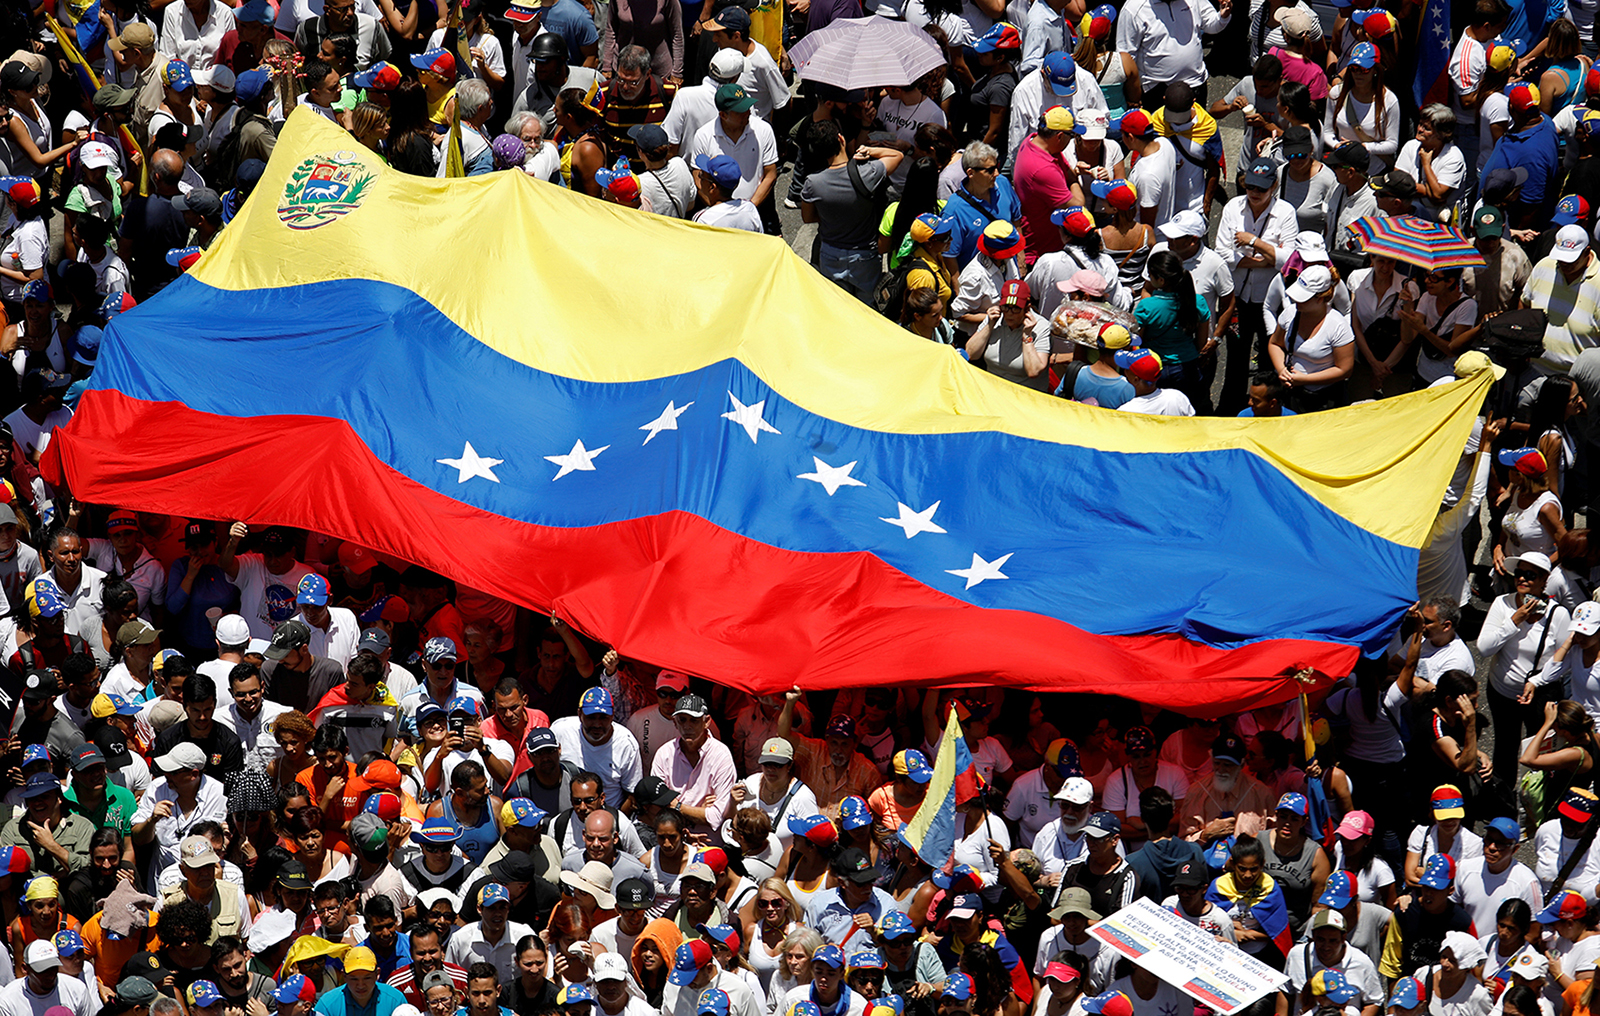 A Human Rights Crisis: Political Prisoners in Venezuela - Impakter